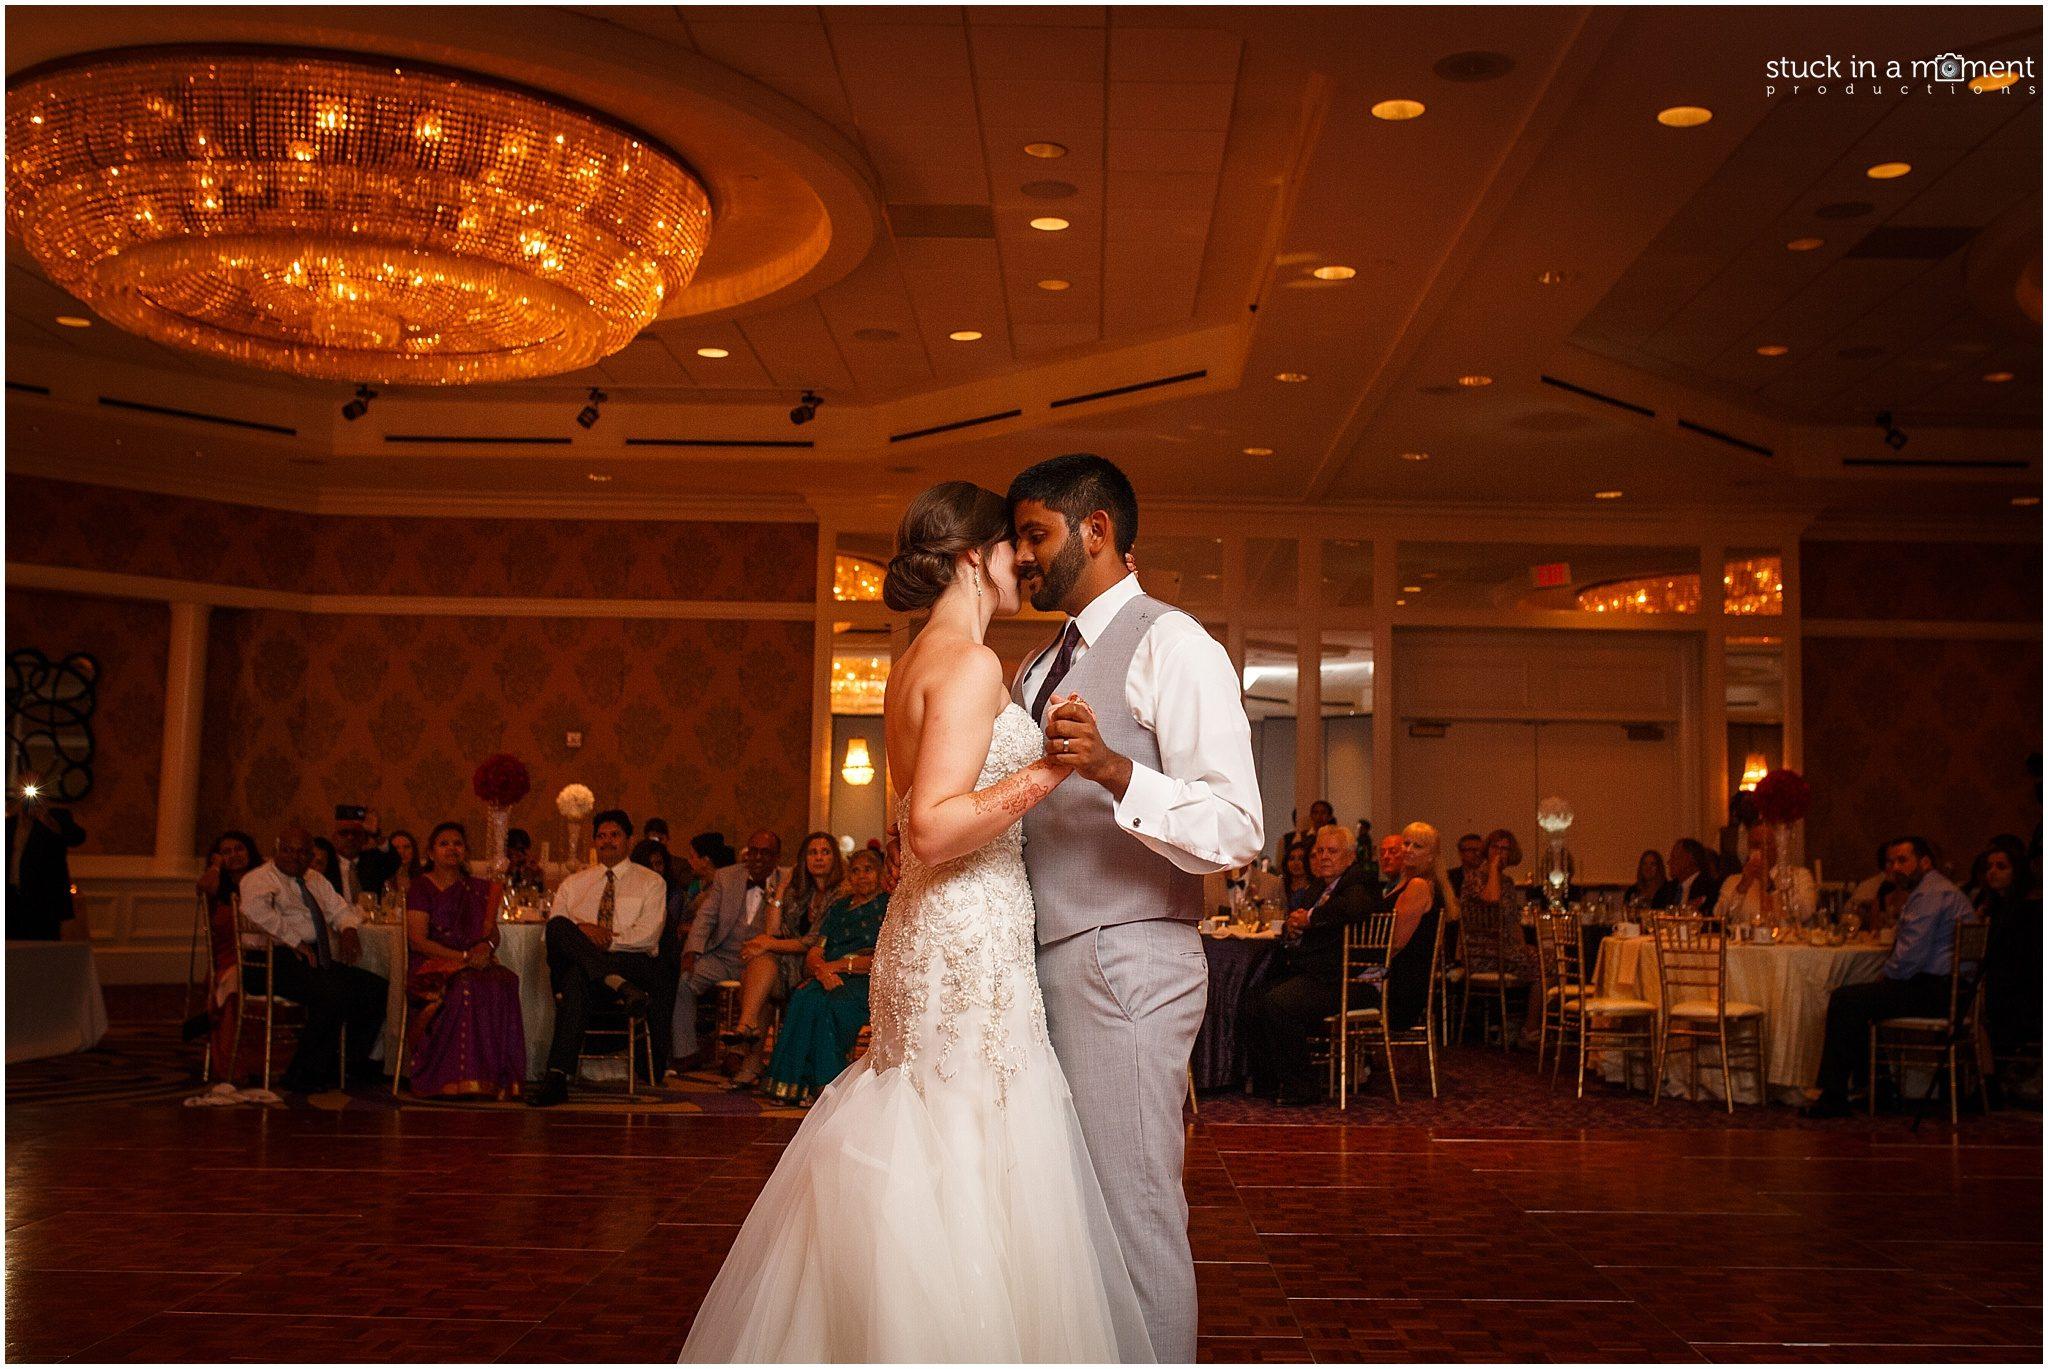 CHARLOTTE INDIAN WEDDING PHOTOGRAPHER VIDEOGRAPHER